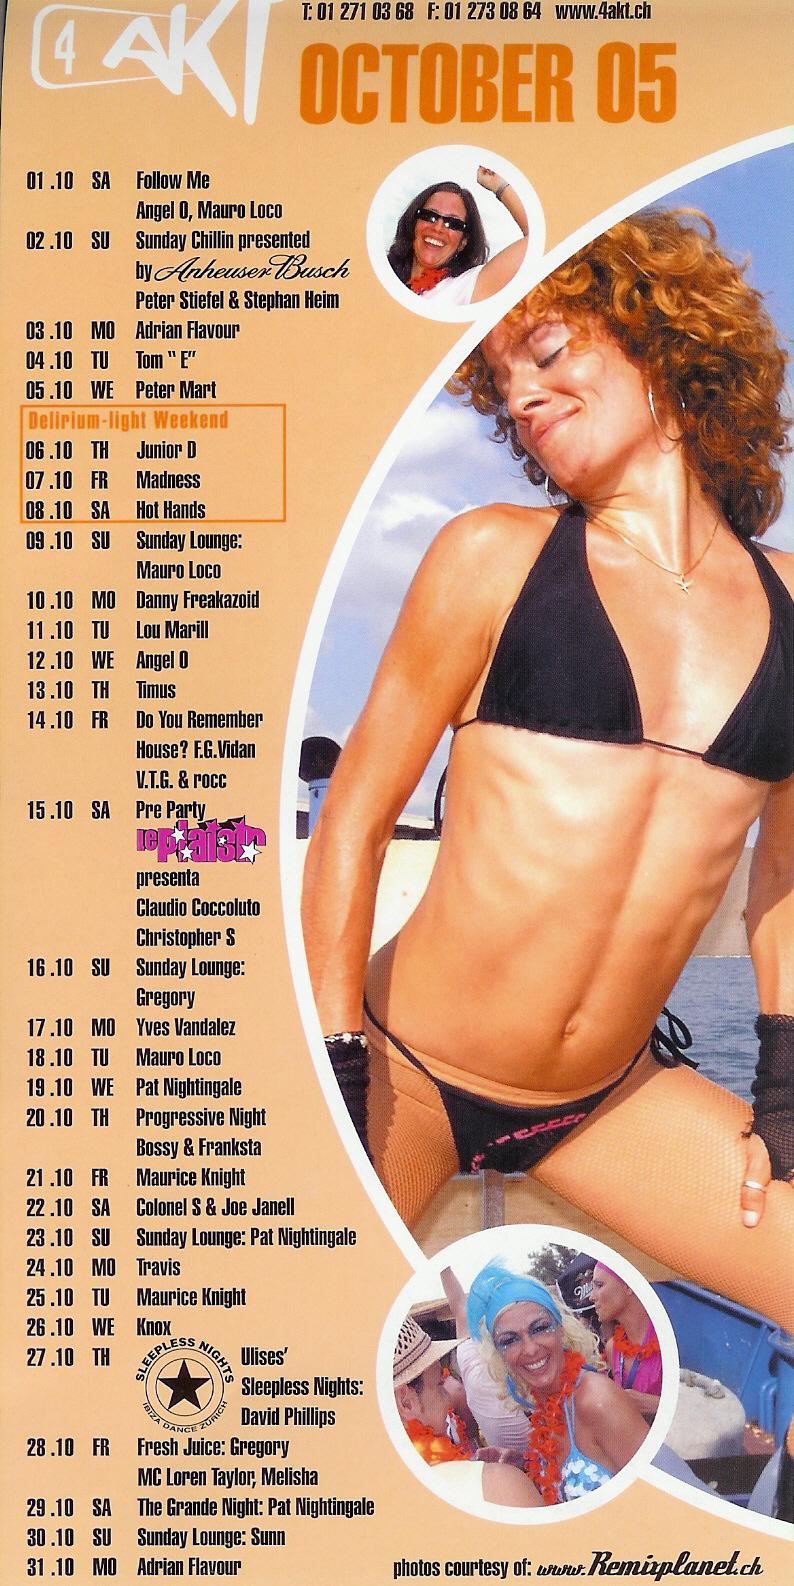 Monatsprogramm Oktober 2005 | 4 Akt (ZH)